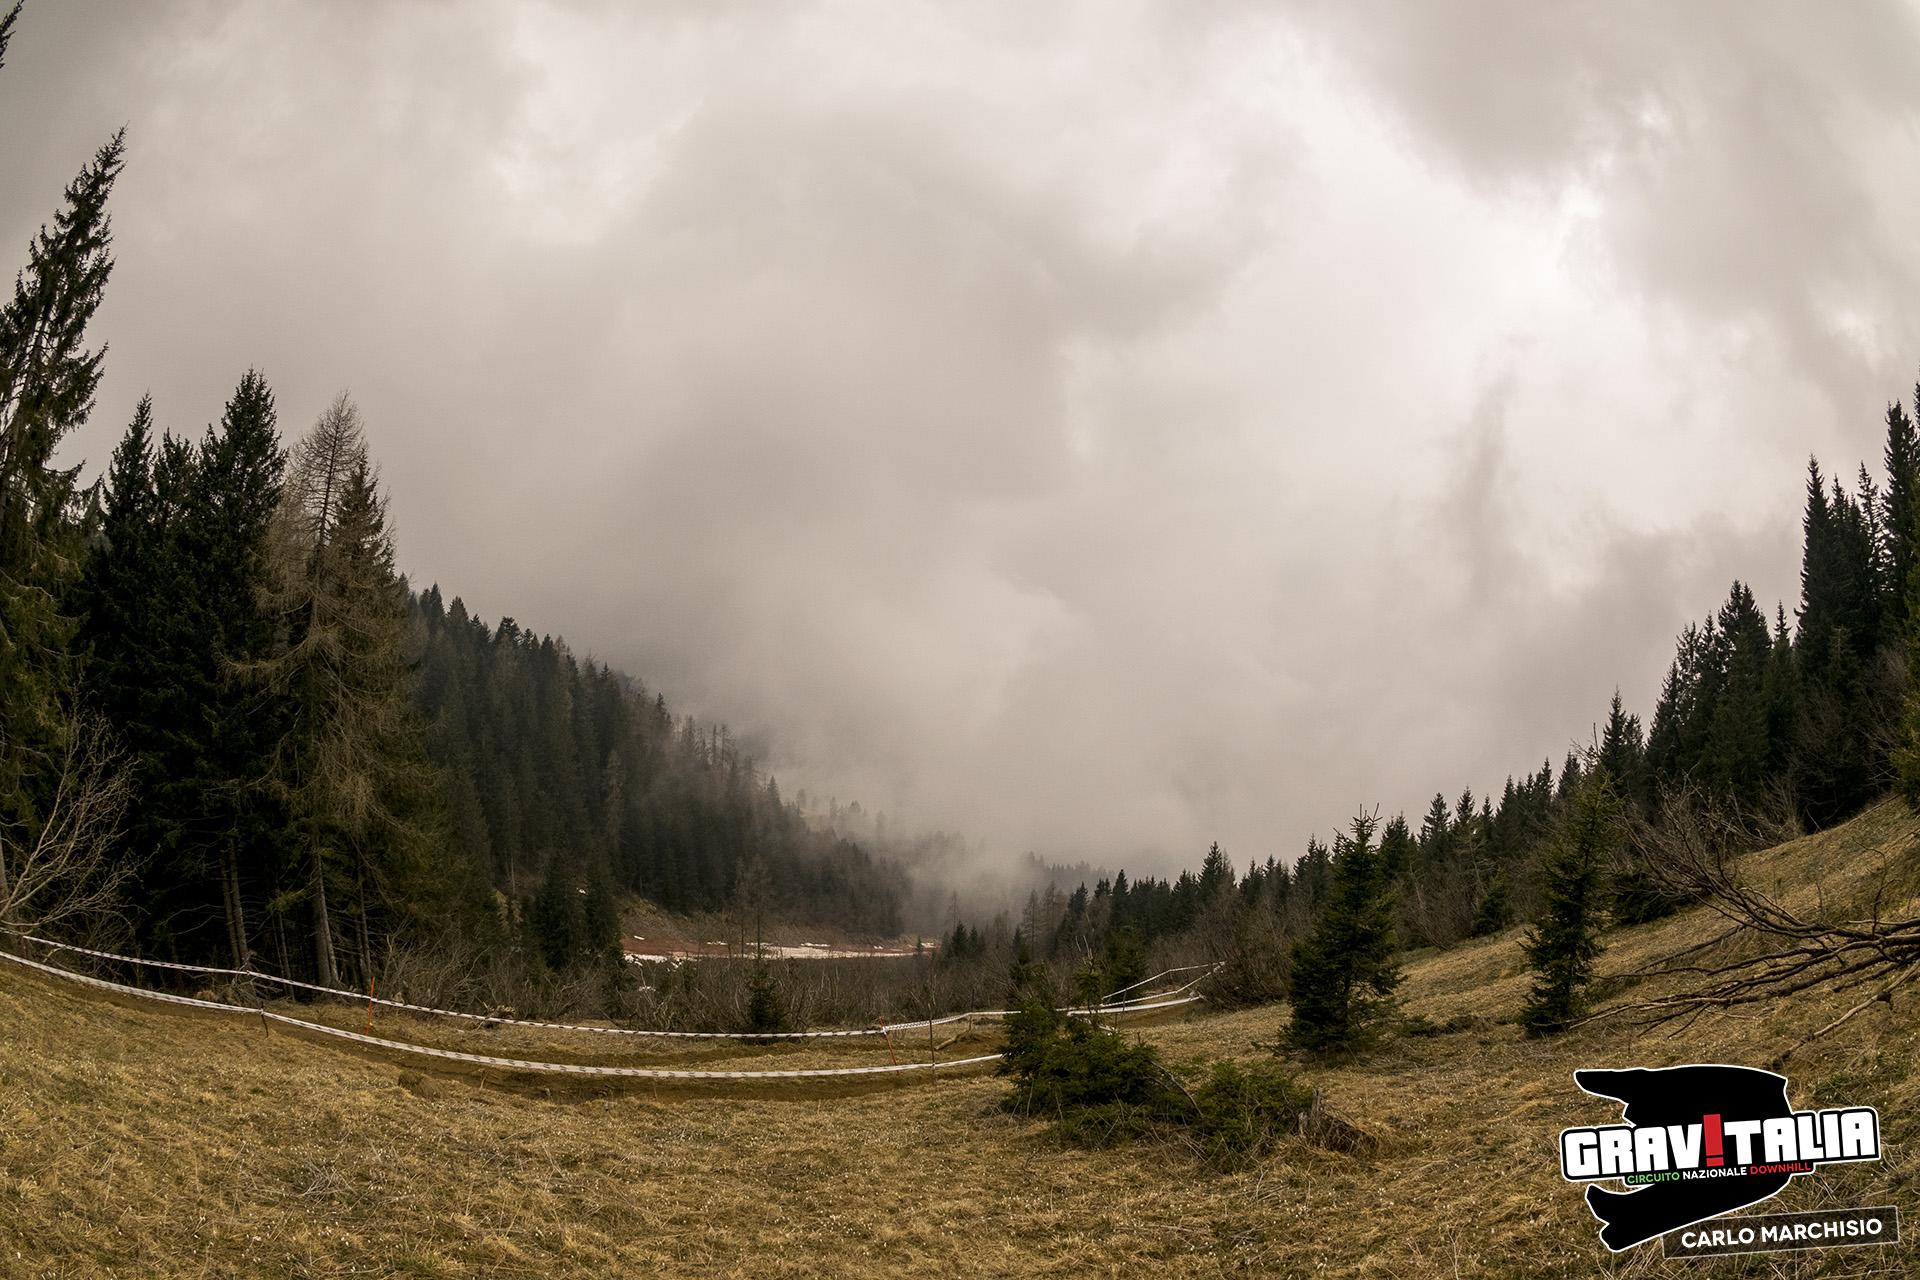 PhotoCarloMarchisio_GIT2015_01_Spiazzi019